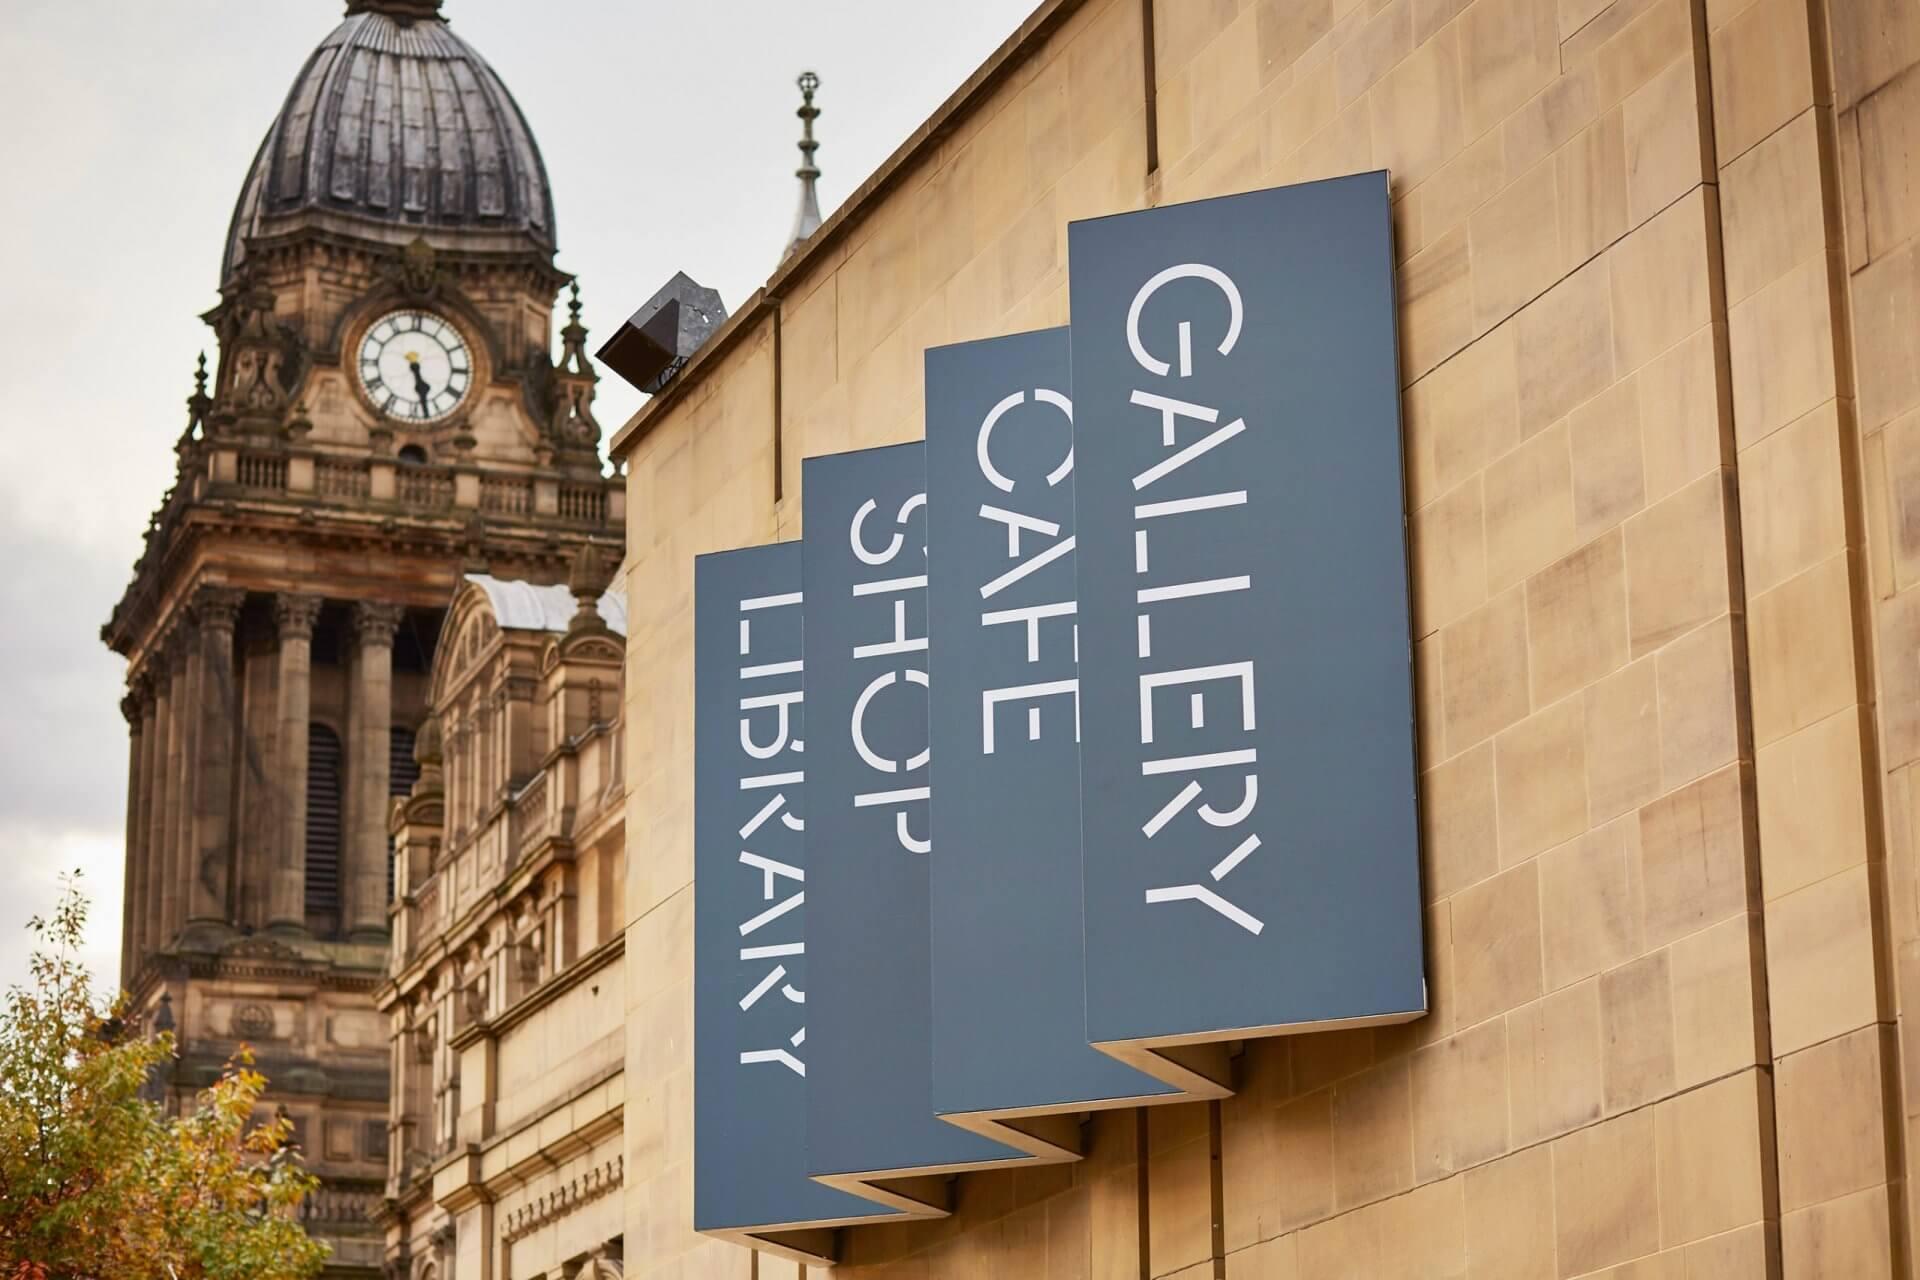 Leeds Art Gallery • Leeds Museums and Galleries • Journal